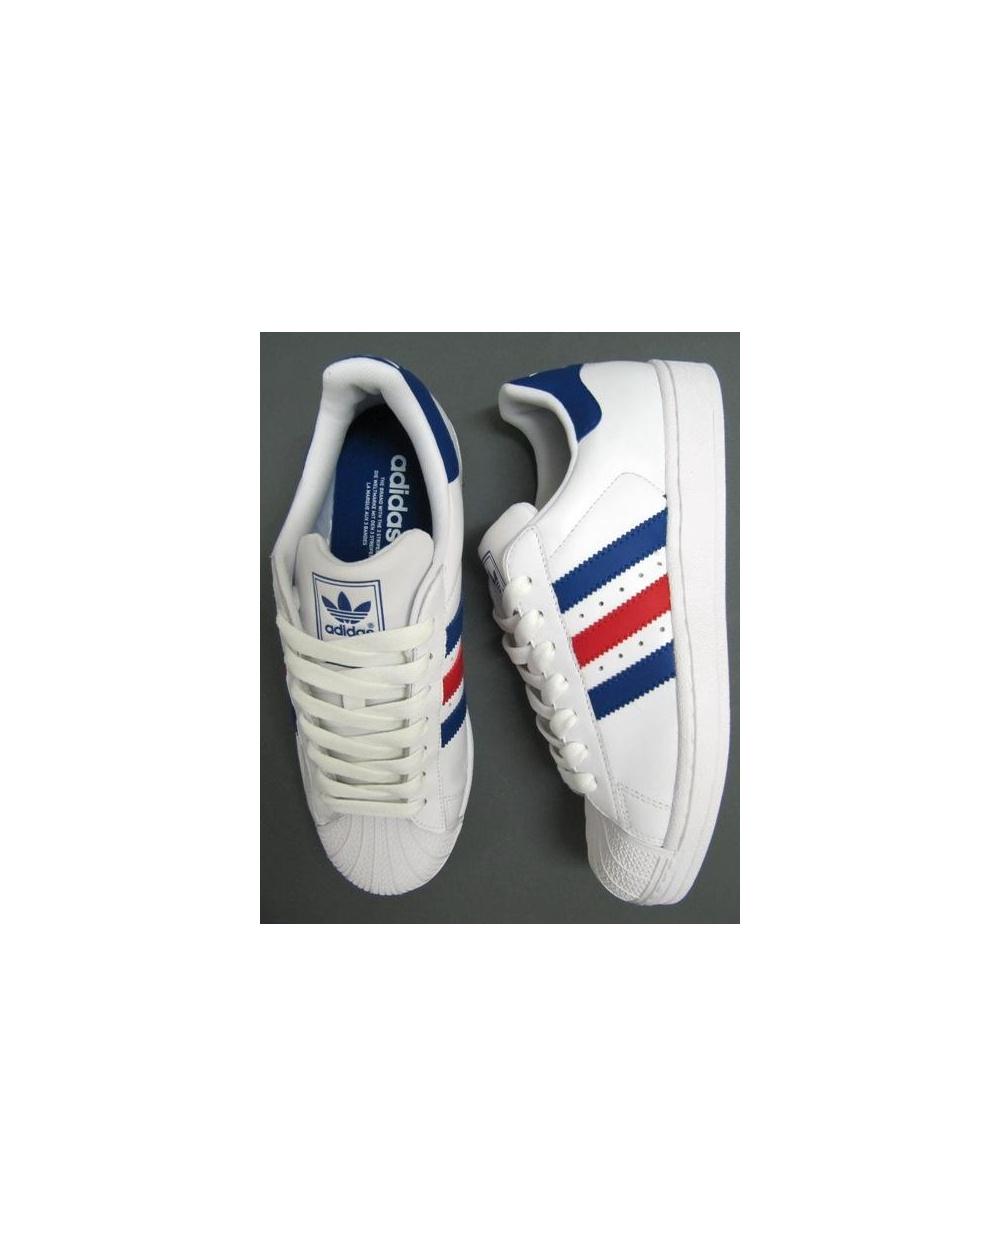 Adidas Superstar 2 Bleu Blanc Rouge WJtZrIZ